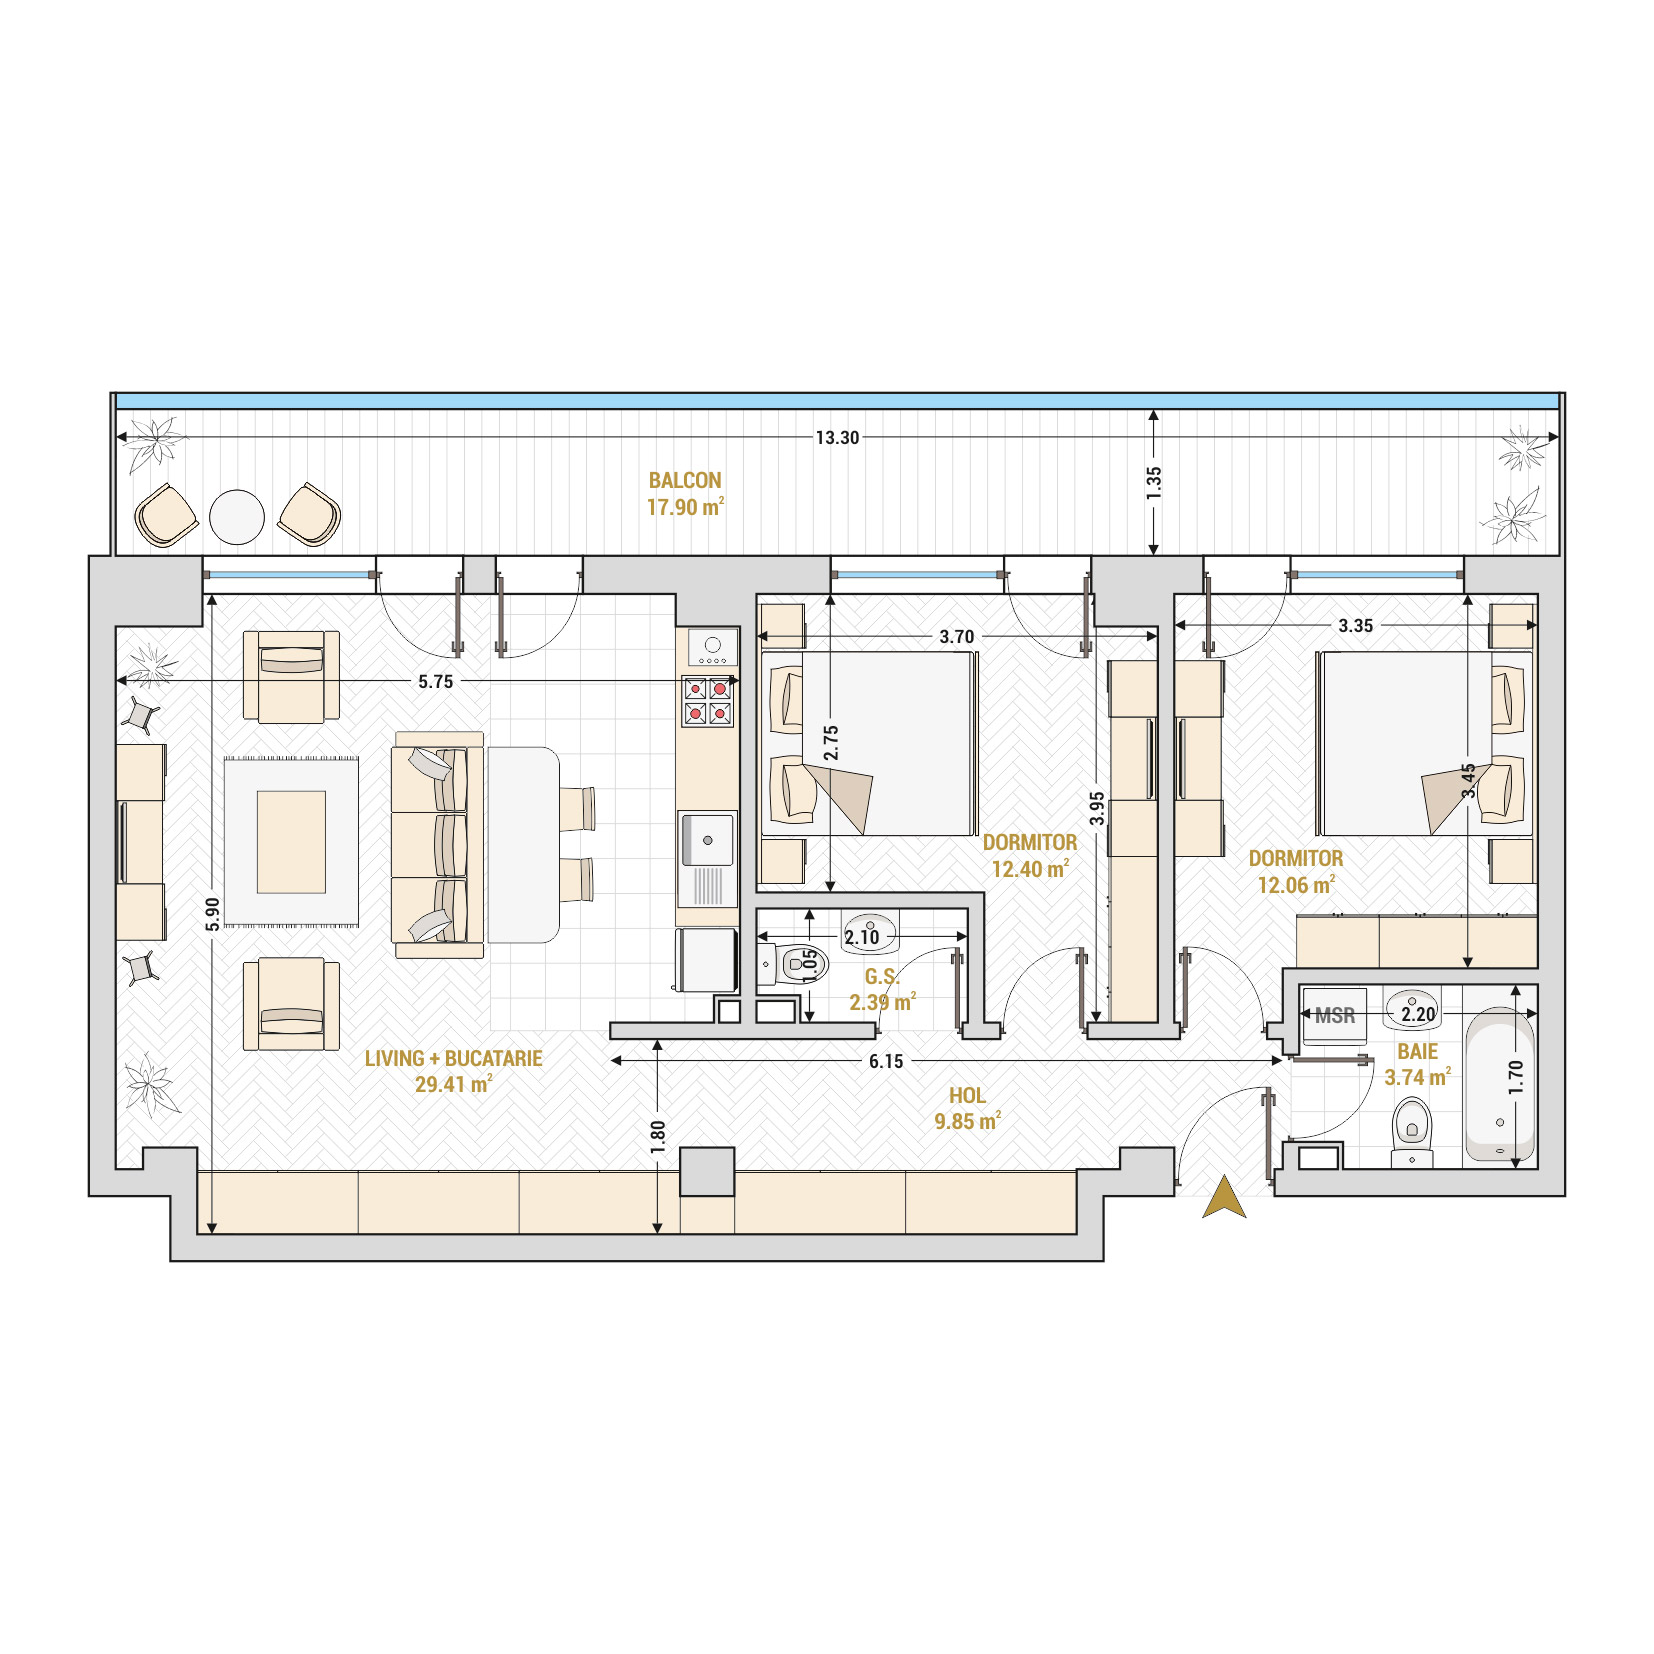 Apartament 3 camere de vanzare Bucuresti - Catedral Residence - Marriott, Piata Unirii, 13 Septembrie, Izvor - Tip 5 - T2A - Open Space